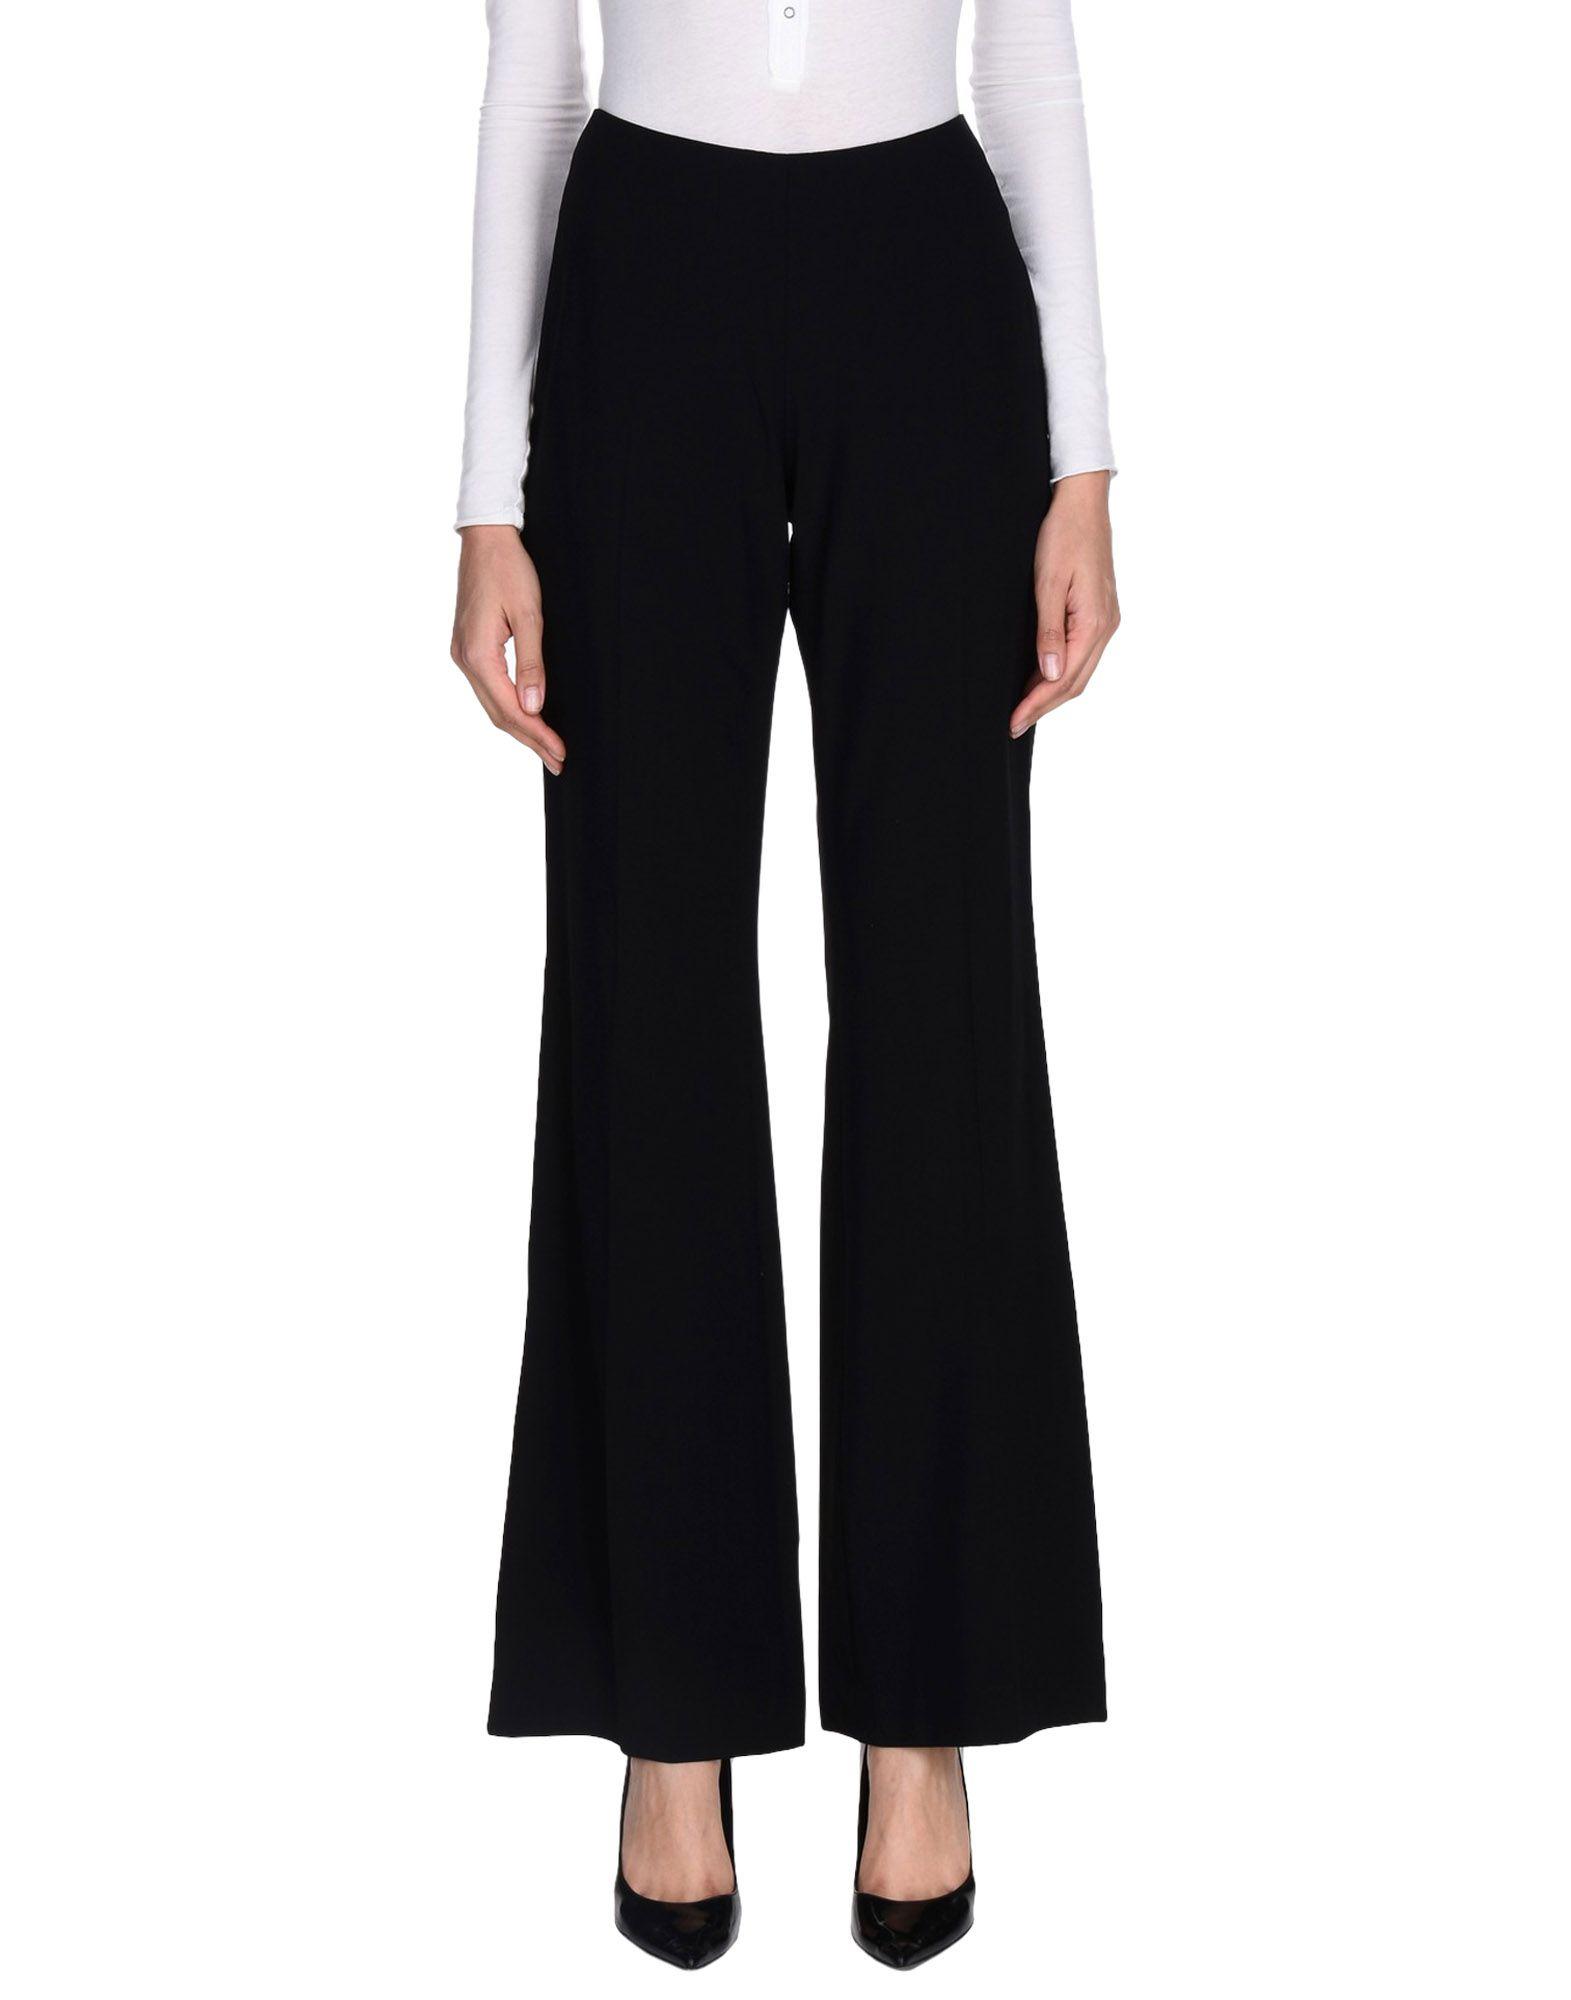 Pantalone Theory Donna - Acquista online su aTWcTlRo